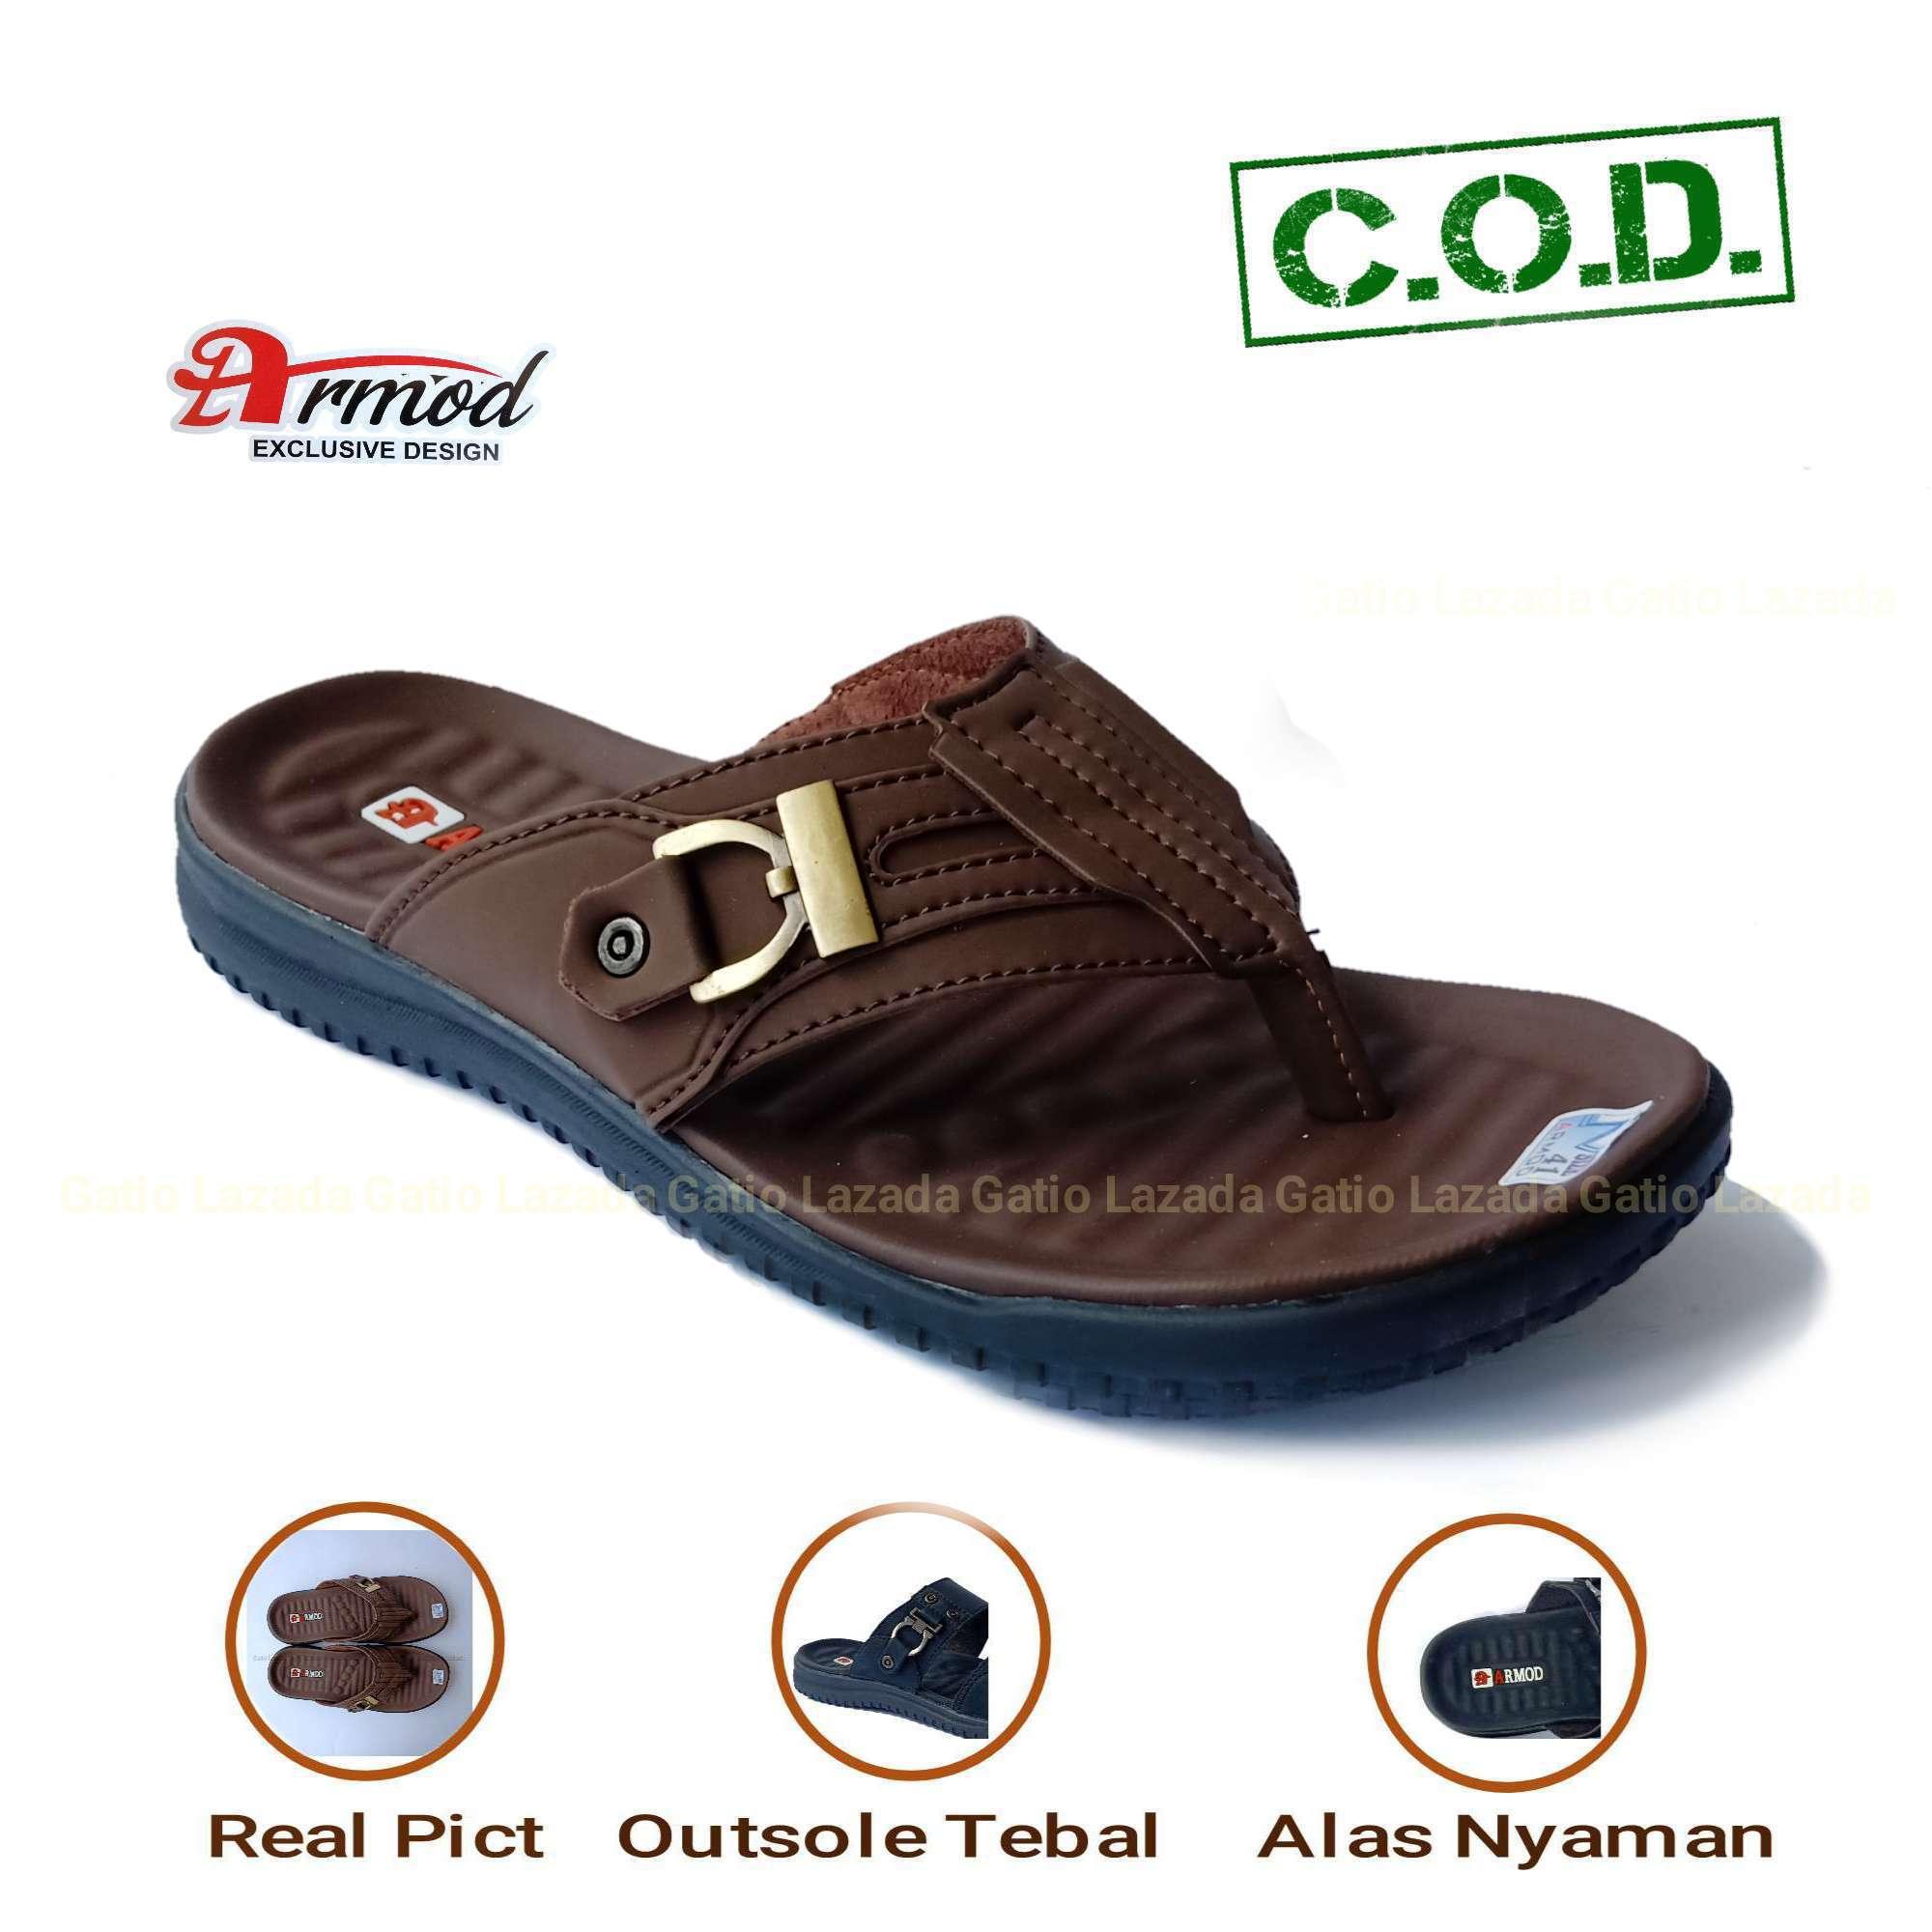 Sandal Kulit / Sandal Pria / Sandal Pria Kulit Casual  Sandal Kulit Pria / Sandal Pria Kulit Murah / Sandal Remaja Sandal Anak Armod AR01